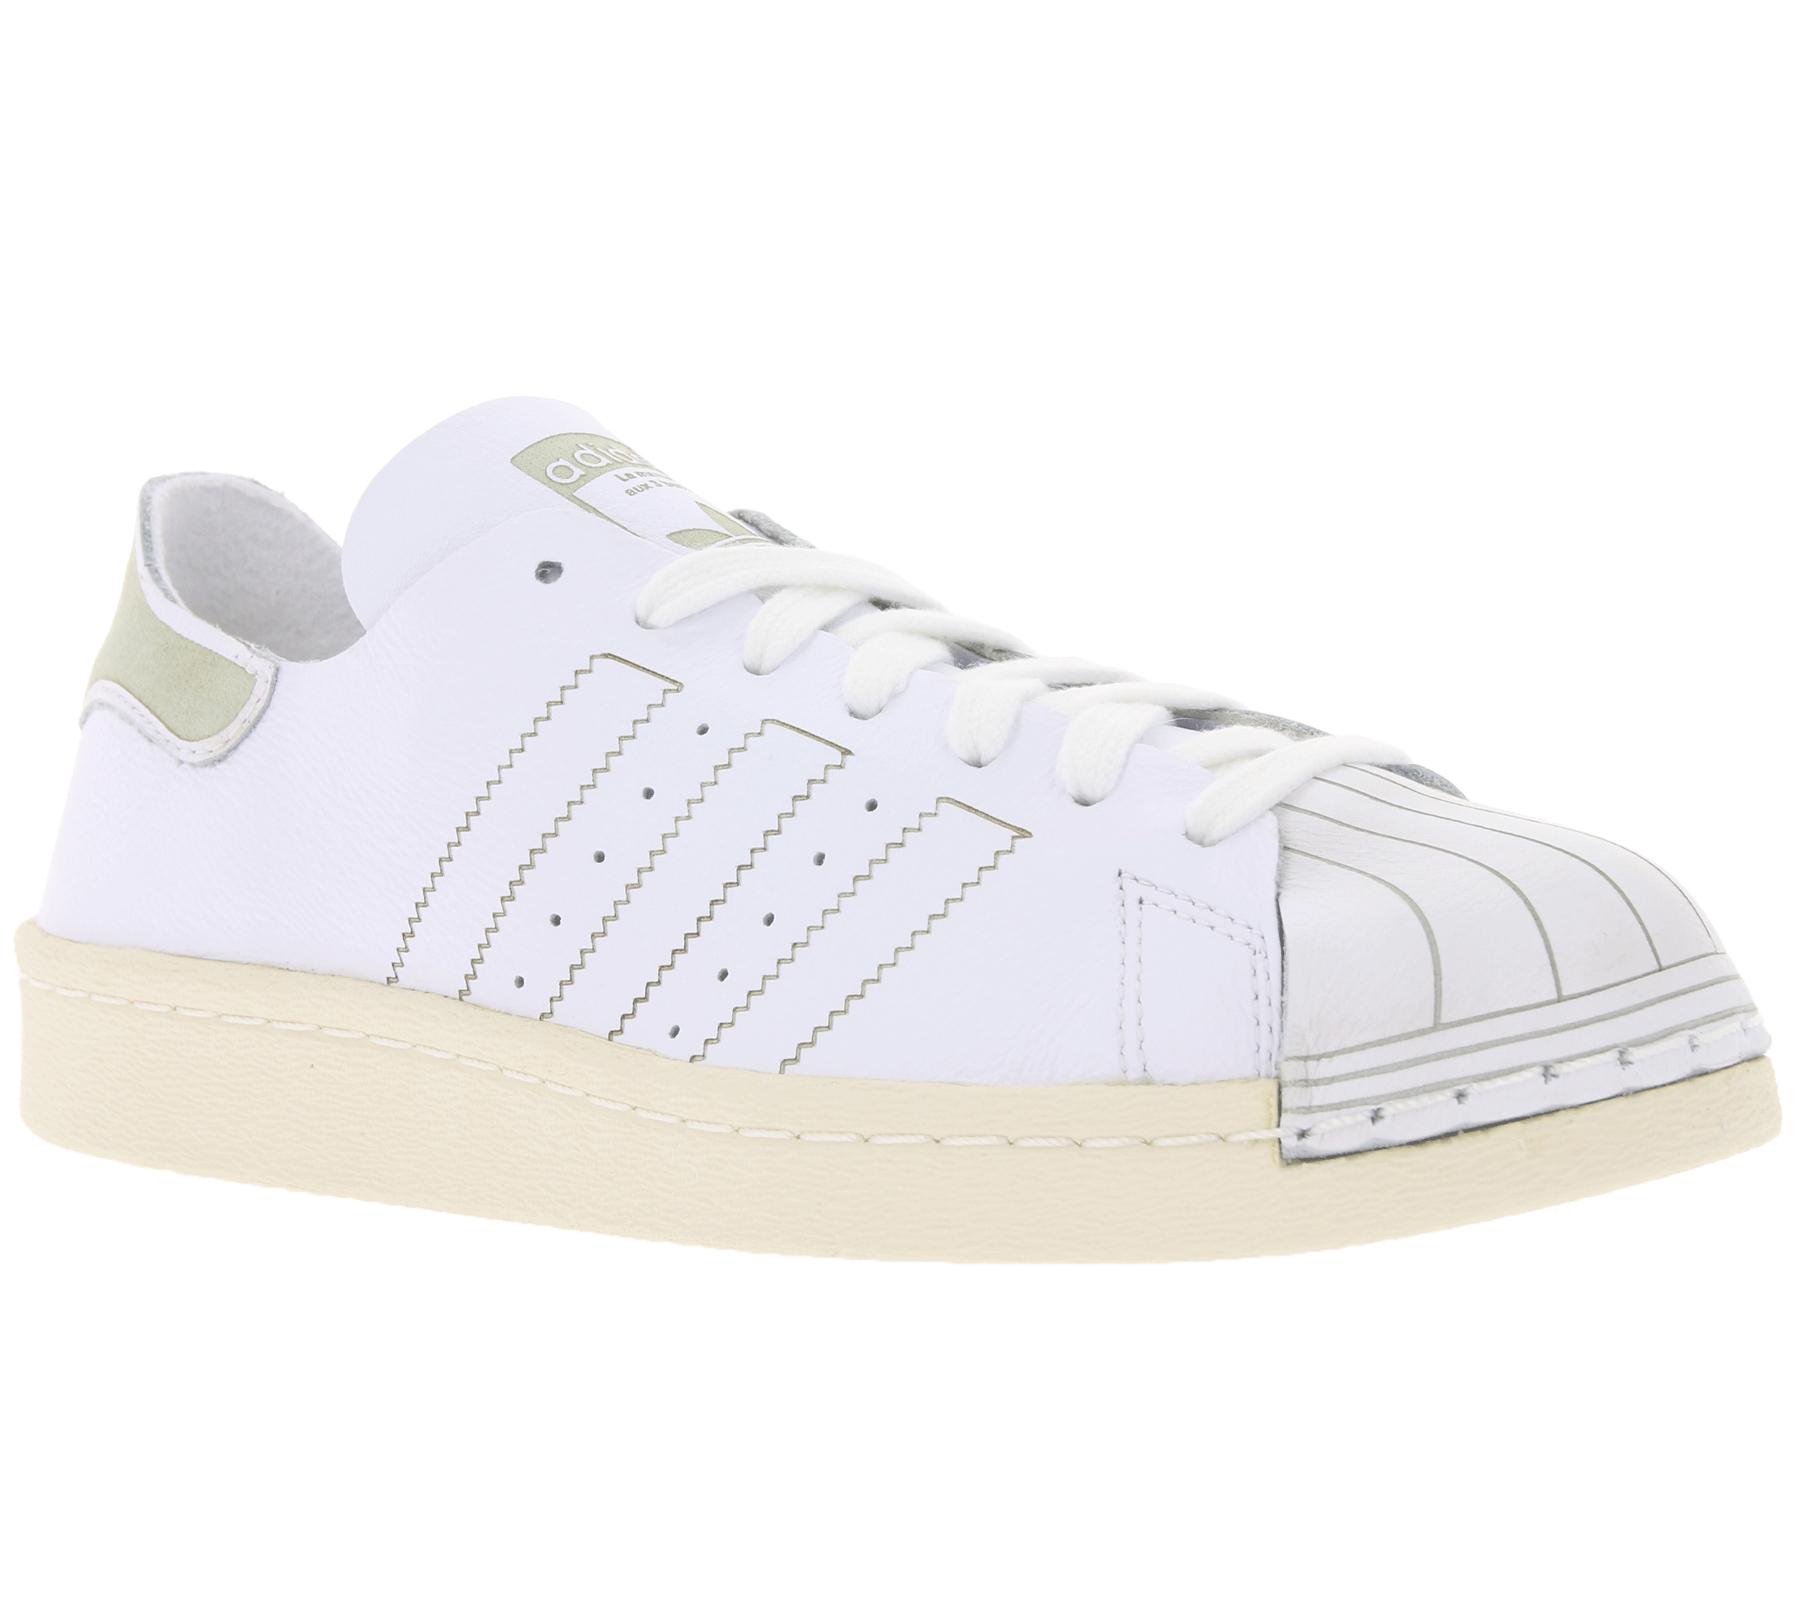 hot sale online 3228d a2169 adidas Originals Superstar 80s Decon cool women s sneaker White